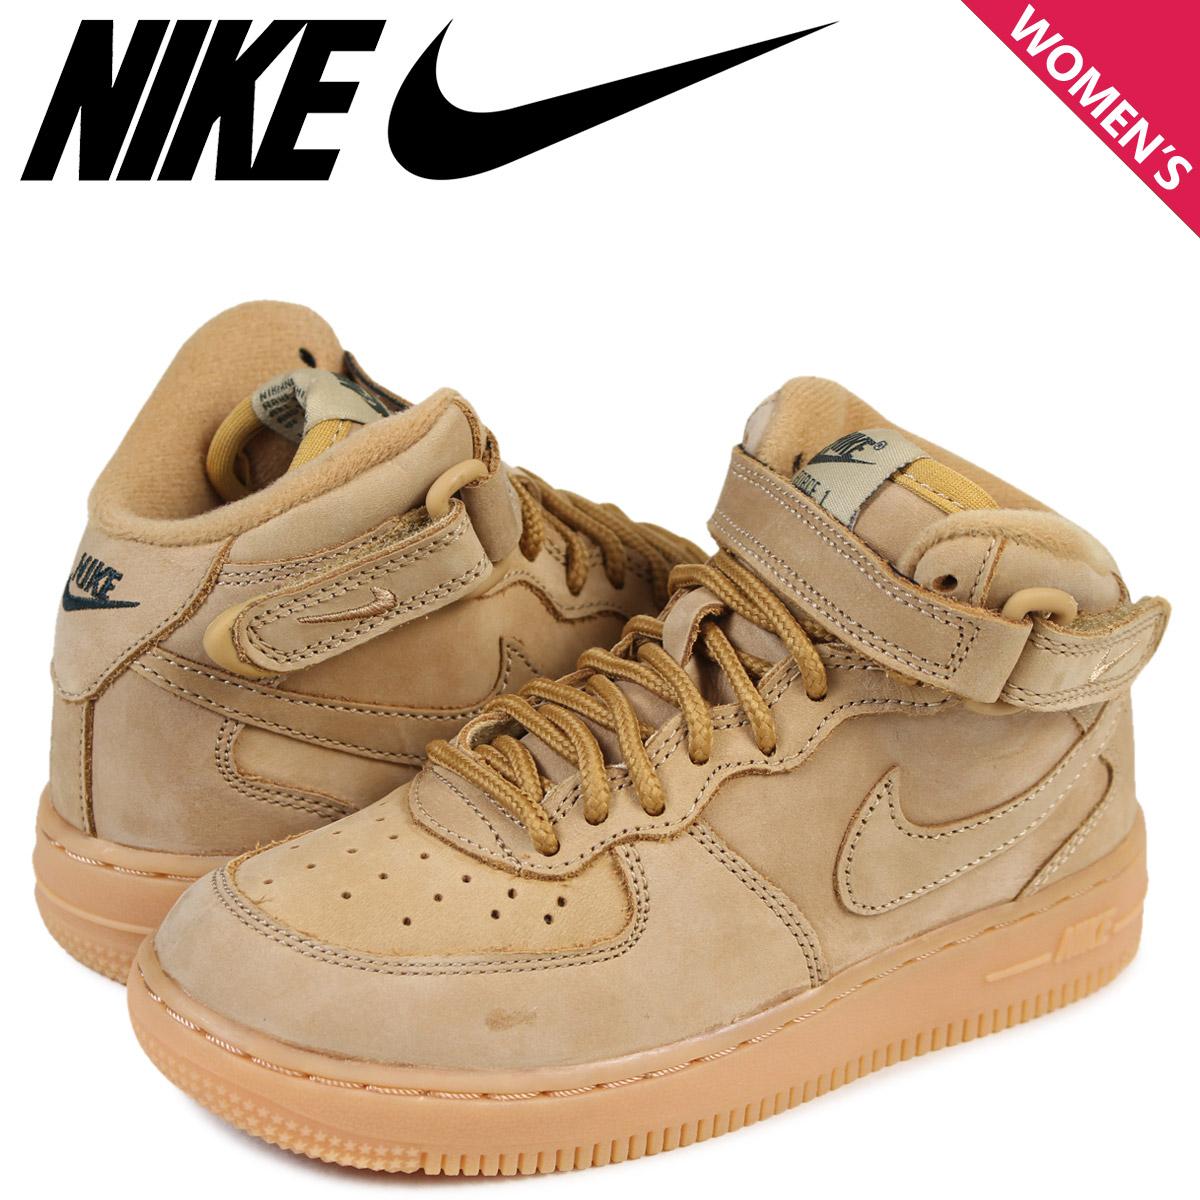 promo code 2e81e bcb97 Nike NIKE air force 1 mid baby sneakers AIR FORCE 1 WB TD AH0757-203 brown